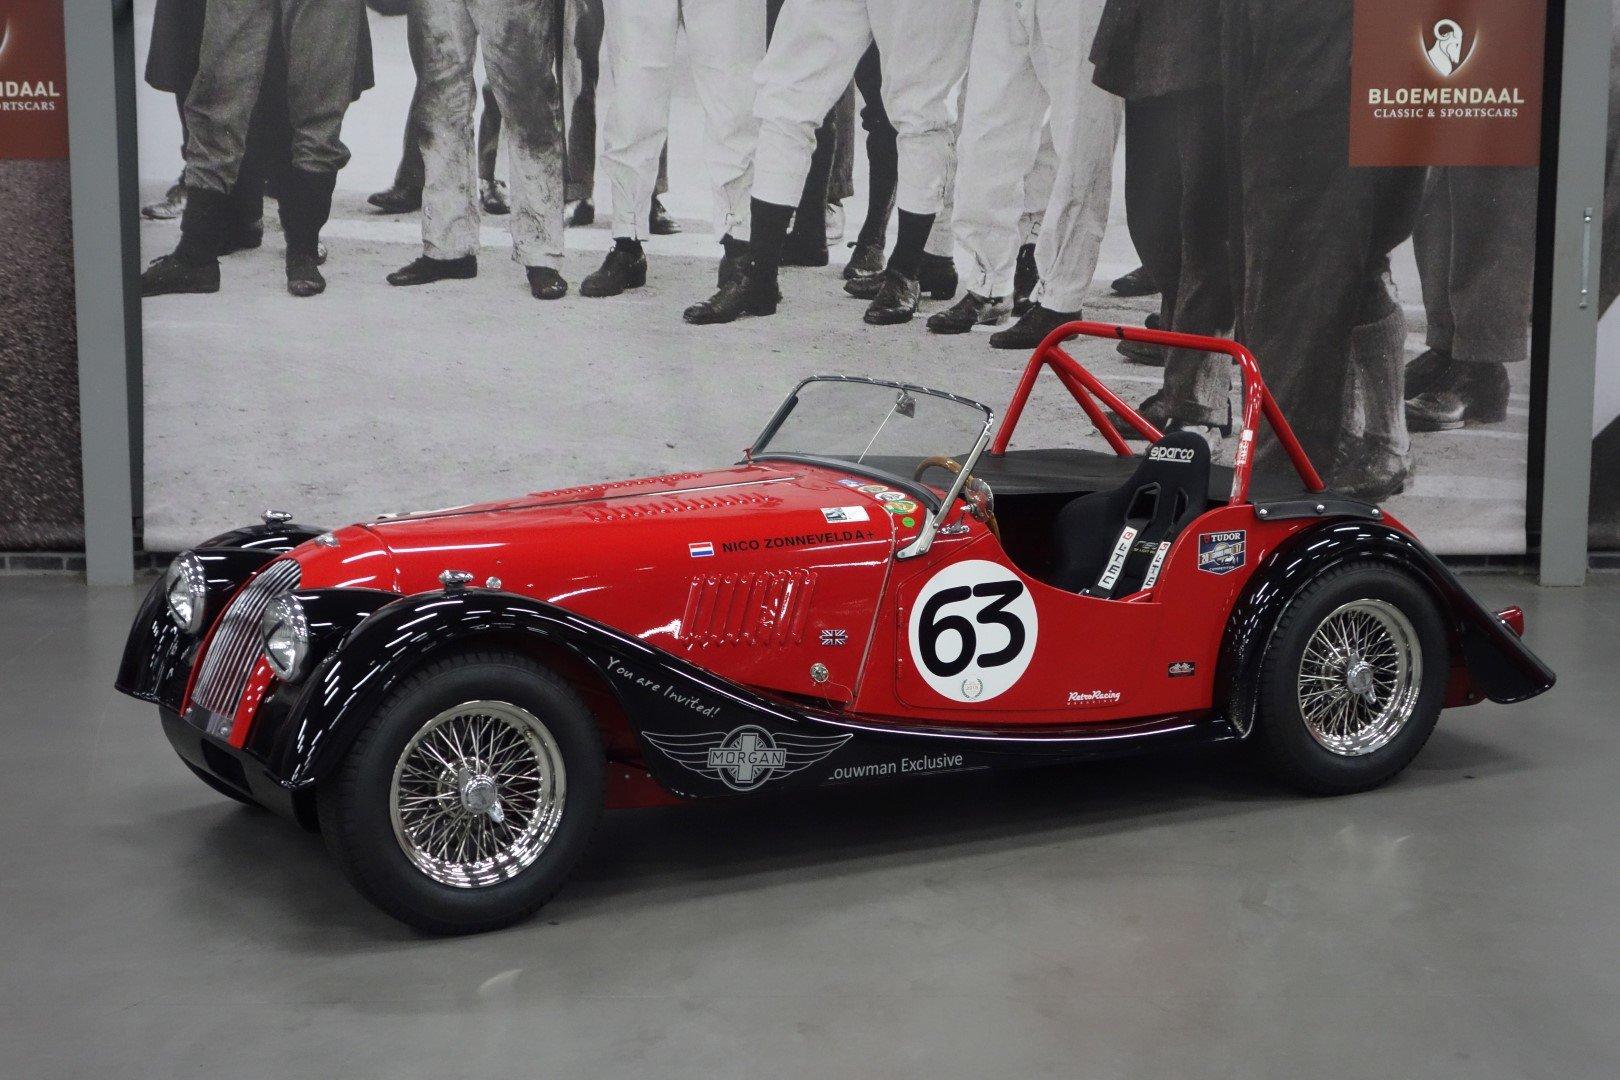 1963 Morgan Plus 4 Super Sport For Sale (picture 1 of 6)